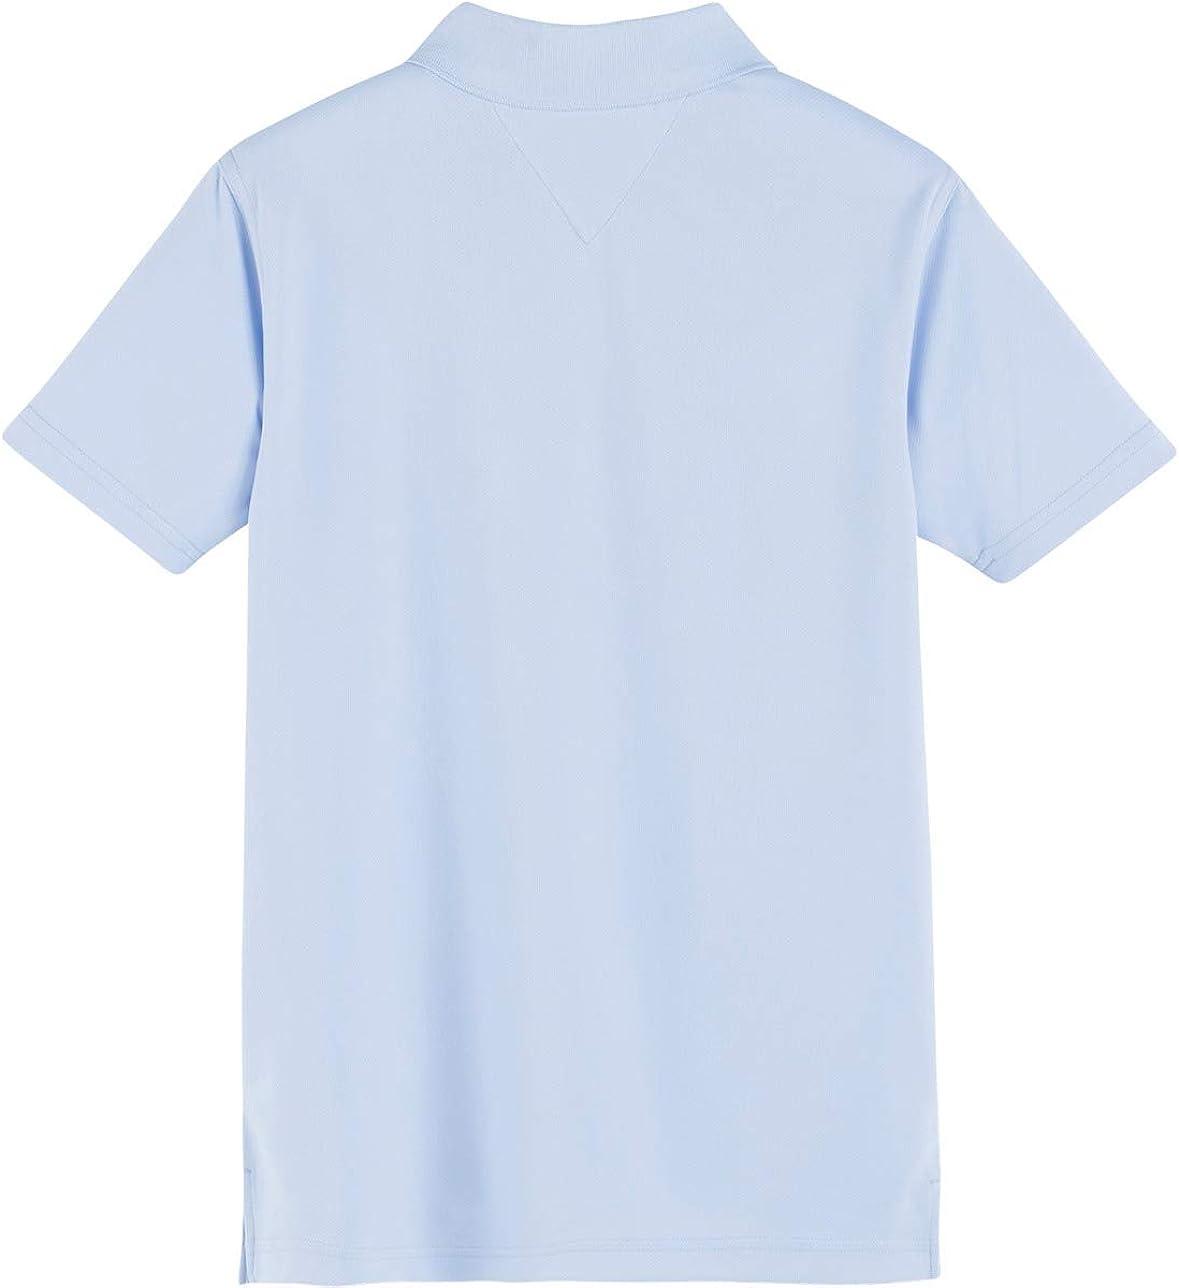 Boys /& Girls School Uniform Clothes Tommy Hilfiger Kids Short Sleeve Performance Co-ed Polo Shirt